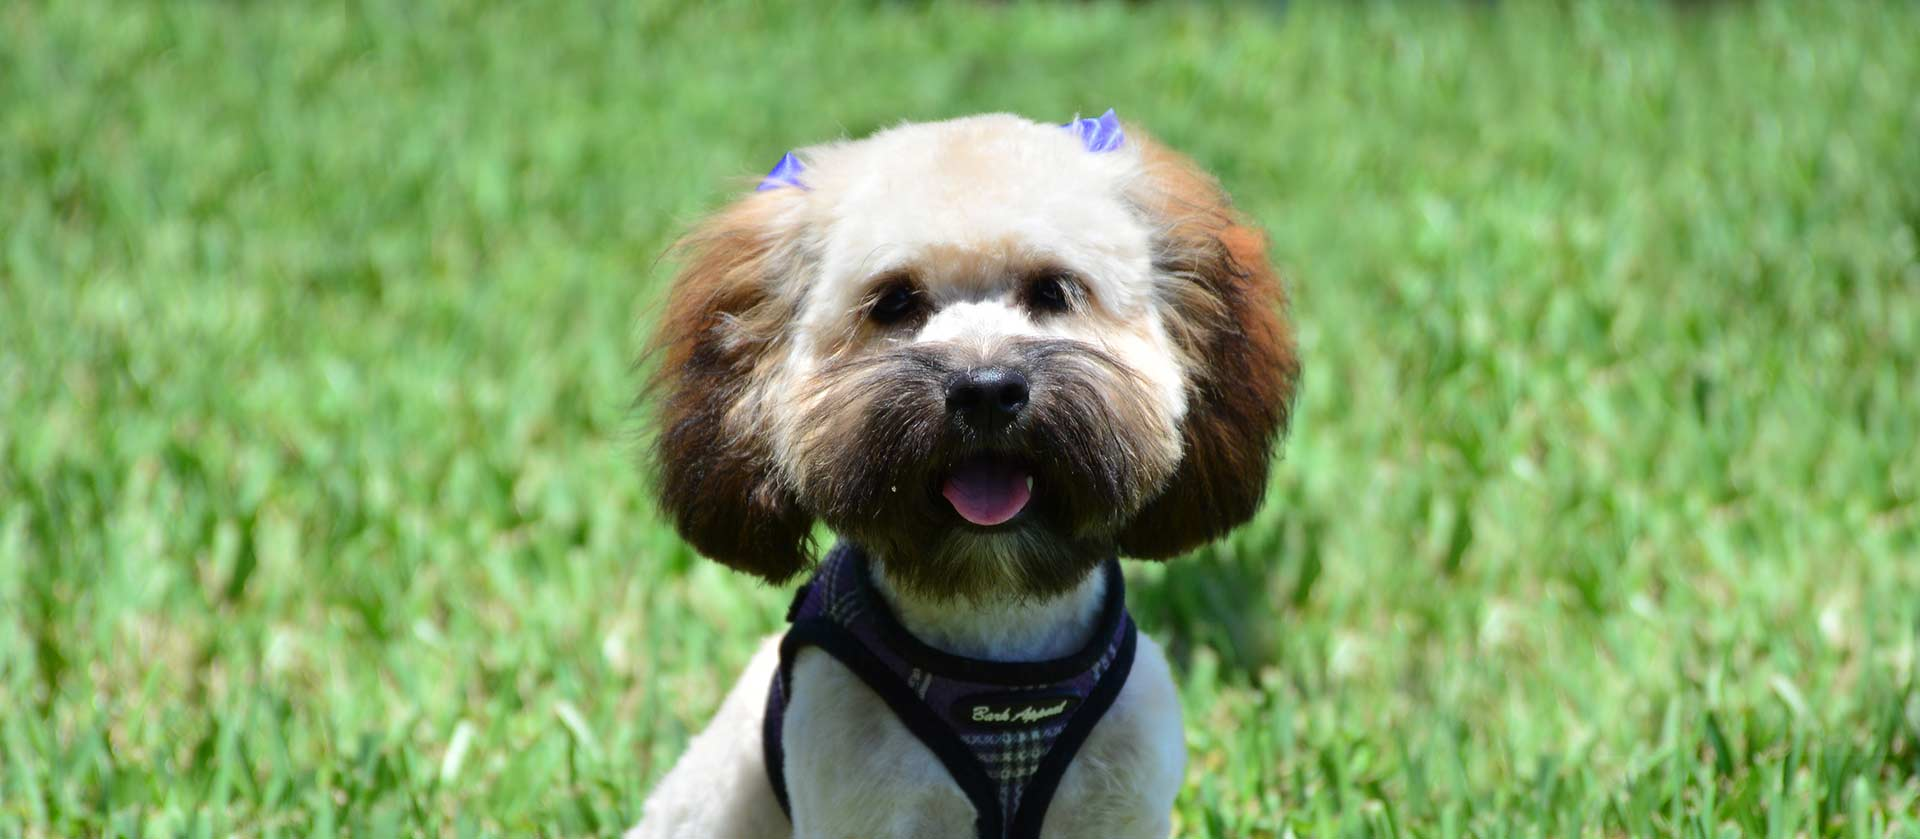 Preferred Dog Veterinarian in Jupiter, Palm Beach County FL